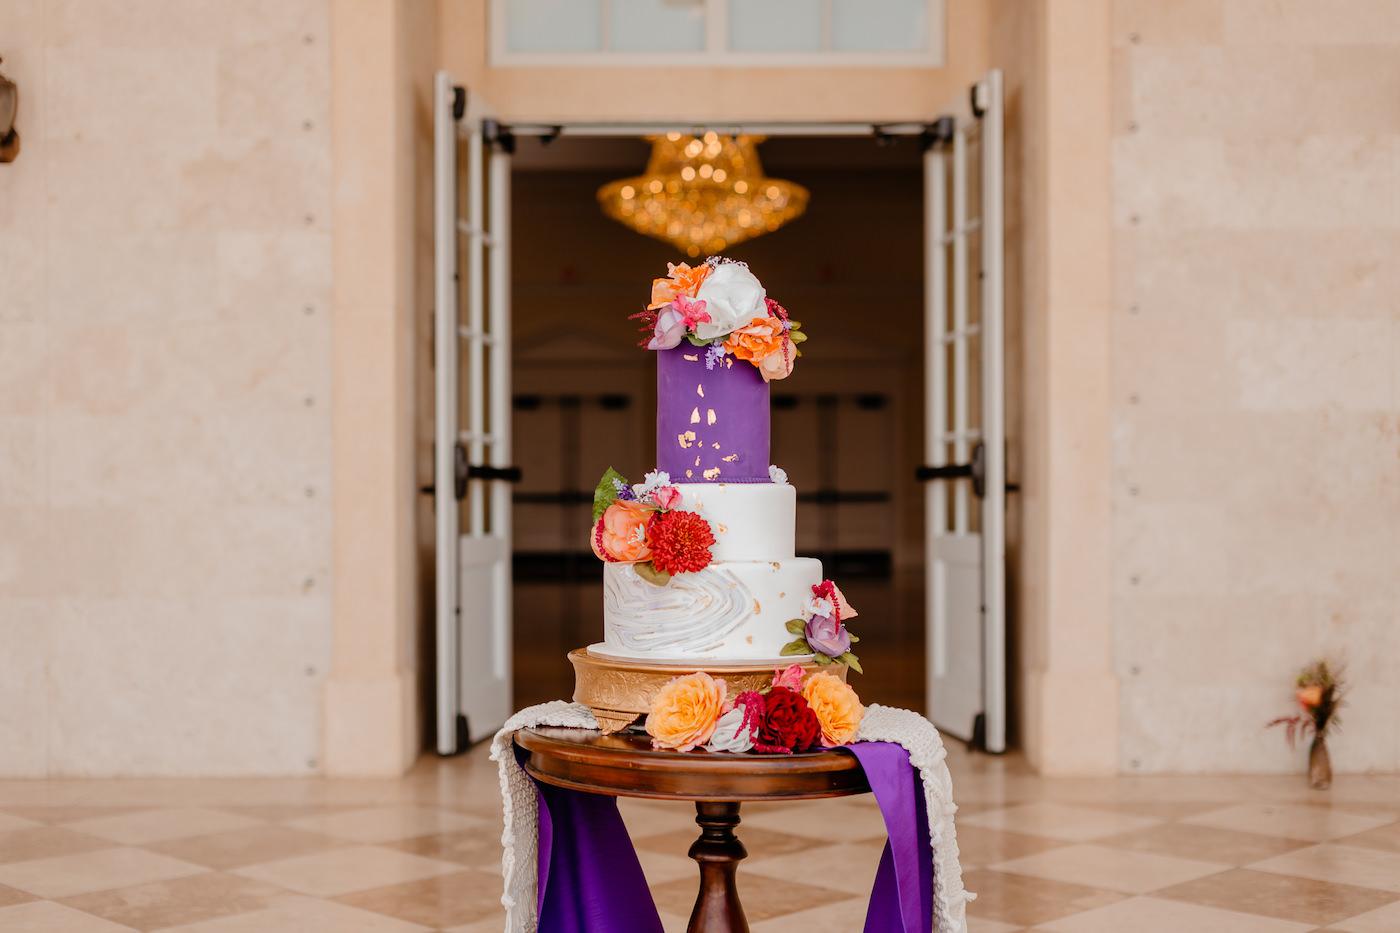 Boho Glam Wedding Cake | Three Tier Purple Marbled Fondant Wedding Cake with Golf Leaf Flecks and Jewel Tone Red and Orange Roses